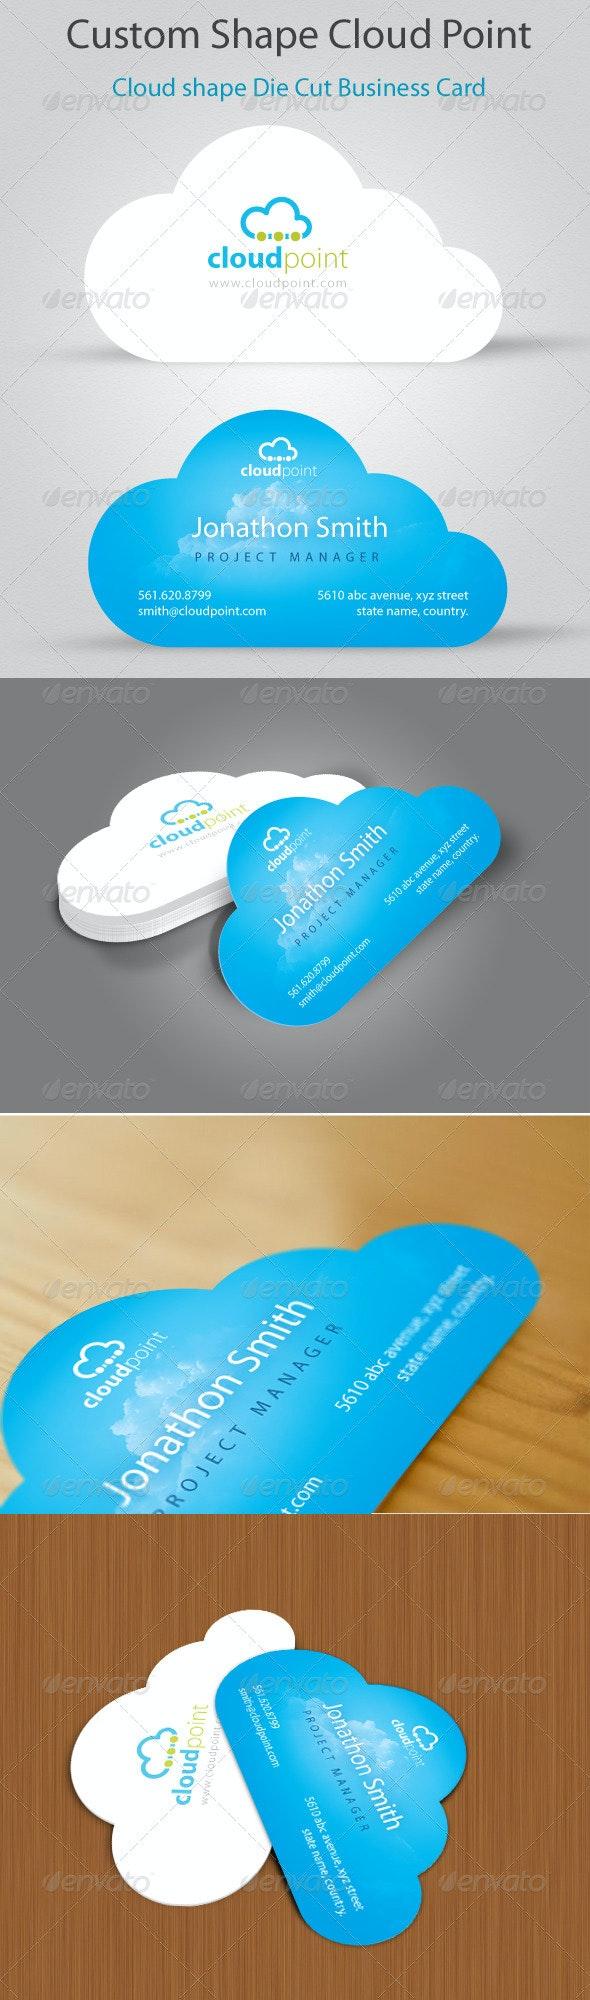 Cloud Point Custom Shape Die cut Business Card - Creative Business Cards